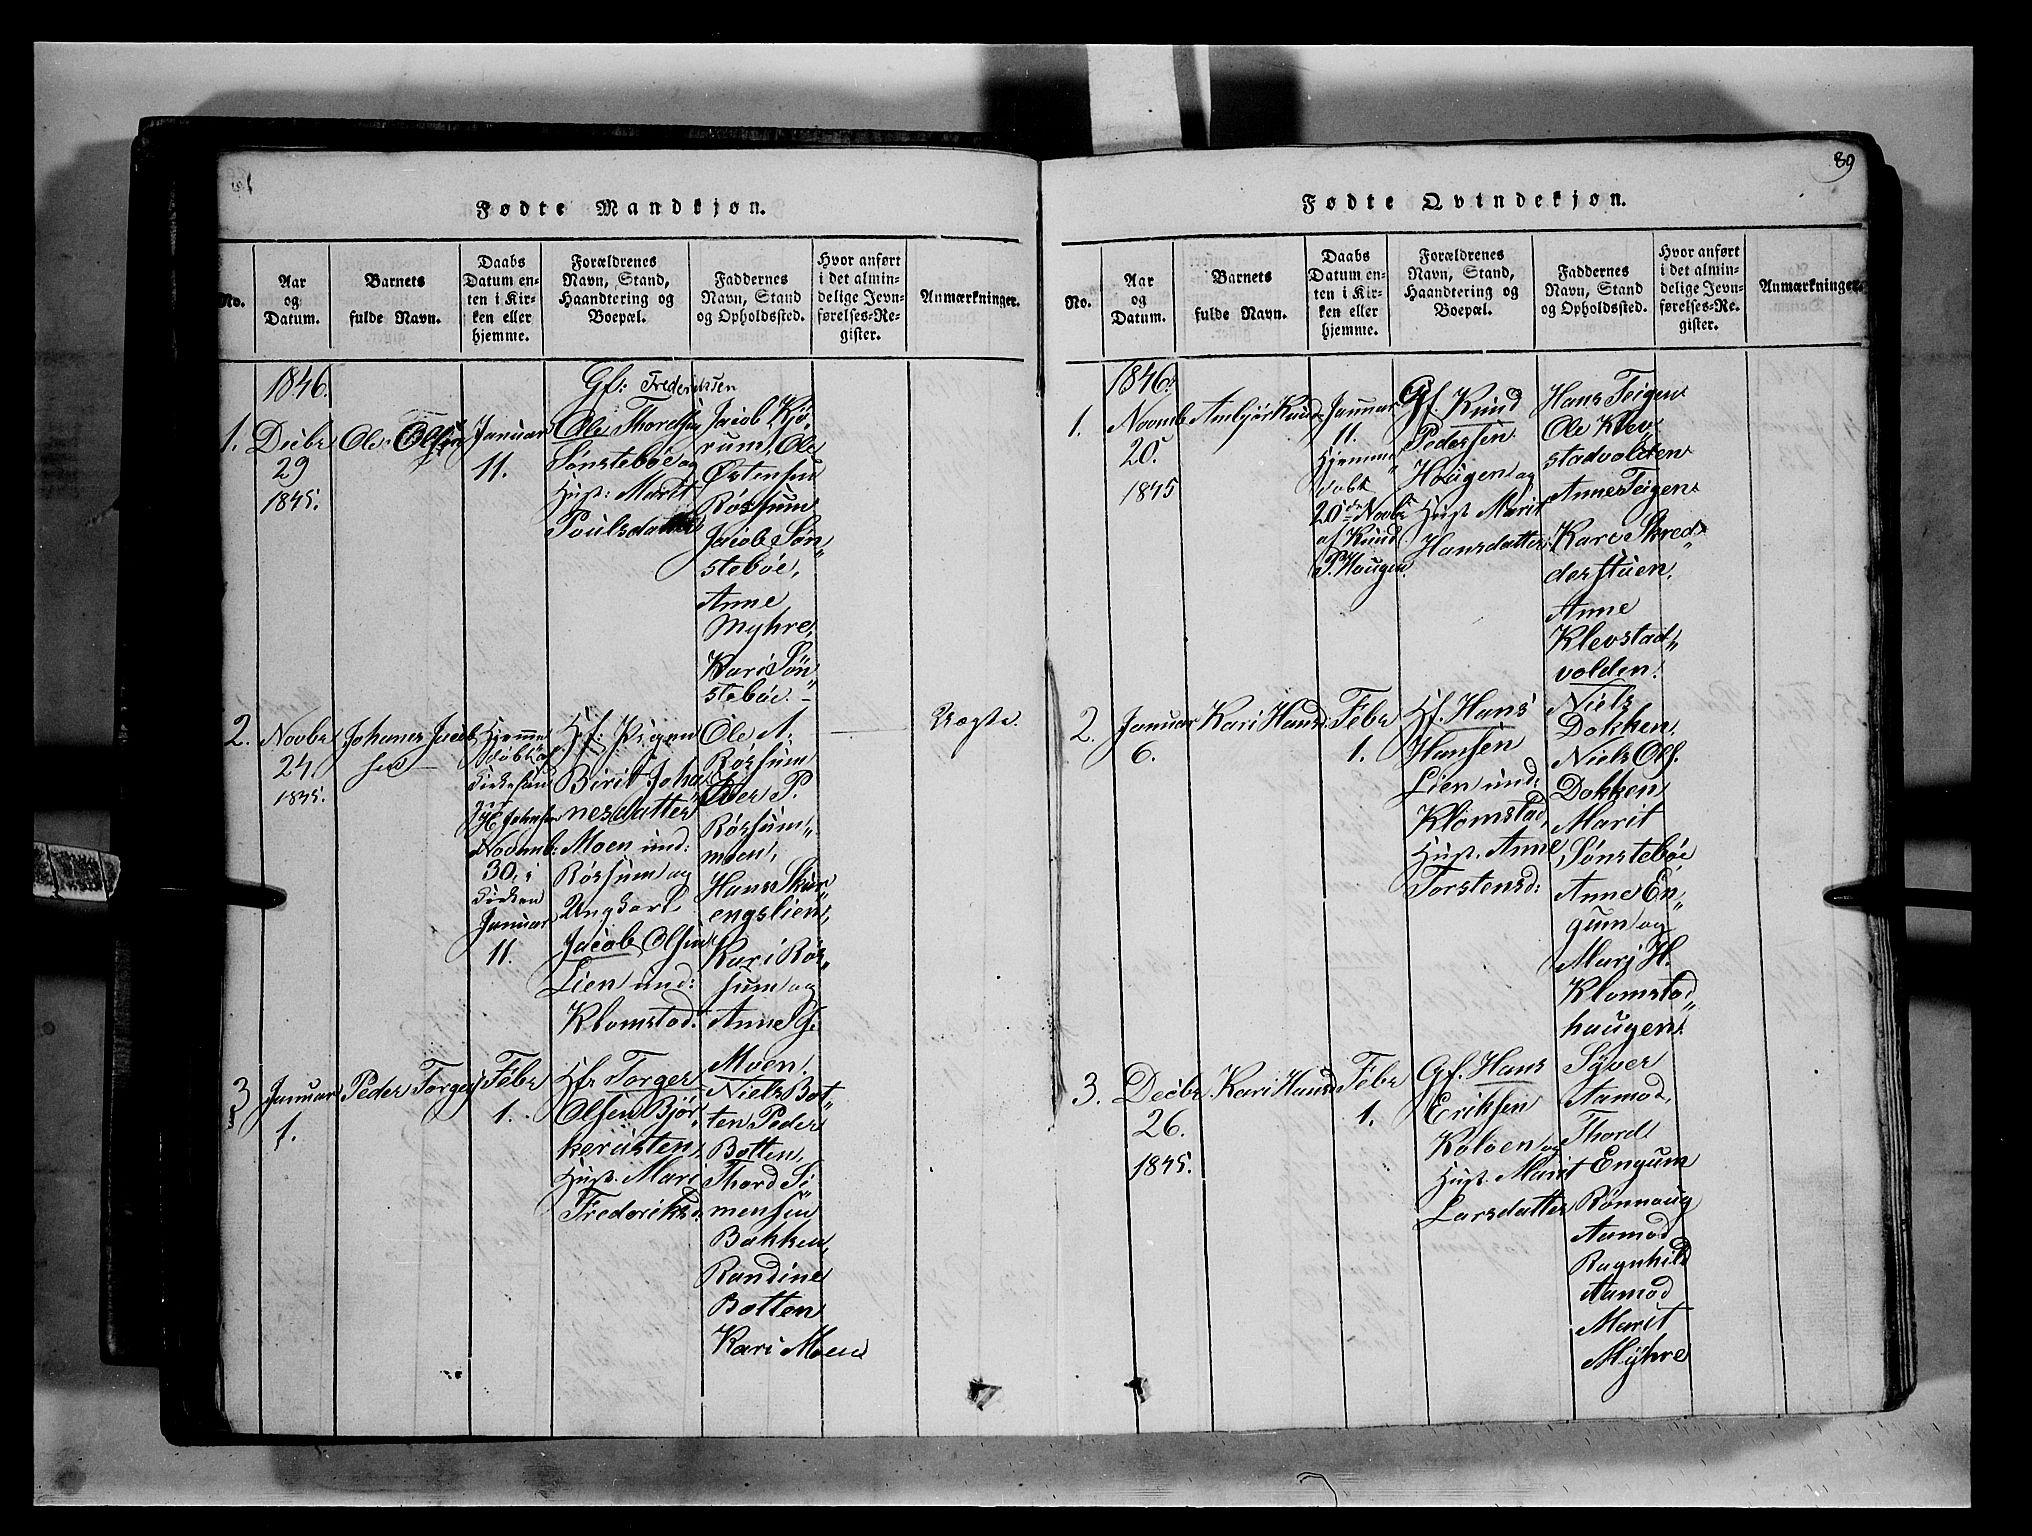 SAH, Fron prestekontor, H/Ha/Hab/L0002: Klokkerbok nr. 2, 1816-1850, s. 89